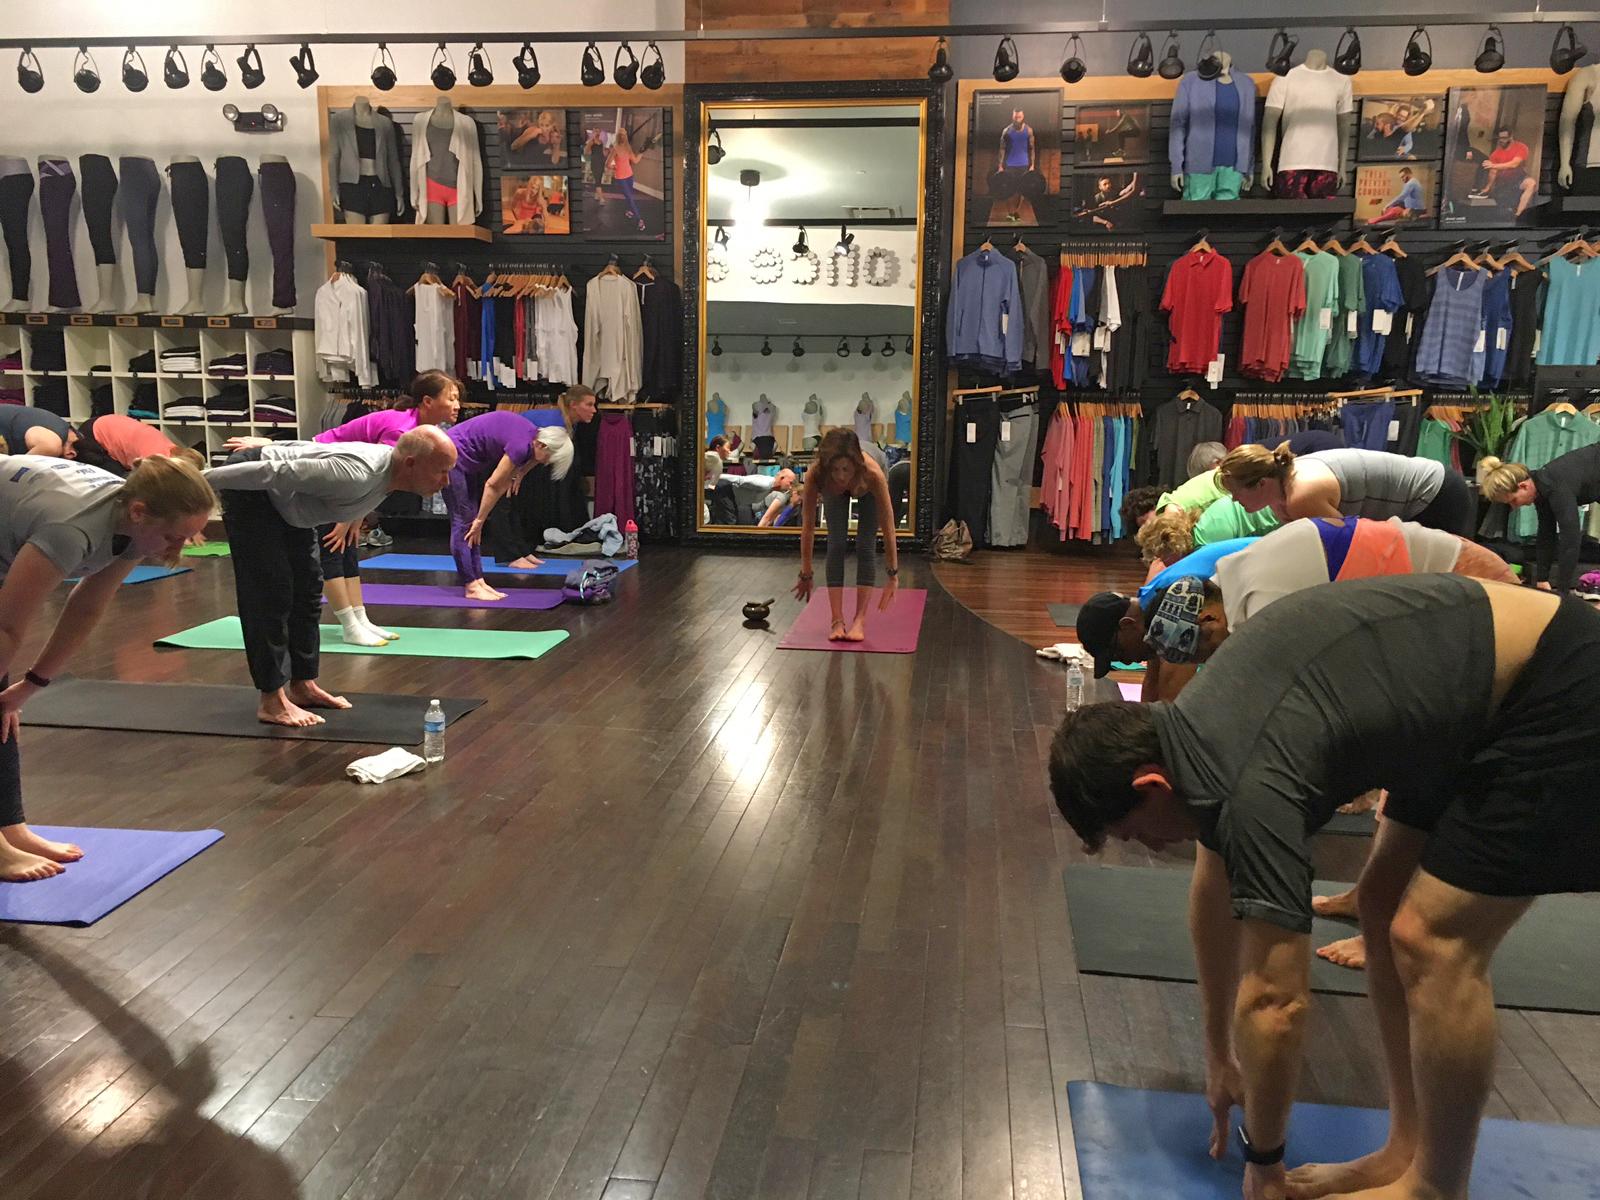 Libby McAvoy teaching yoga at Lululemon Athletica